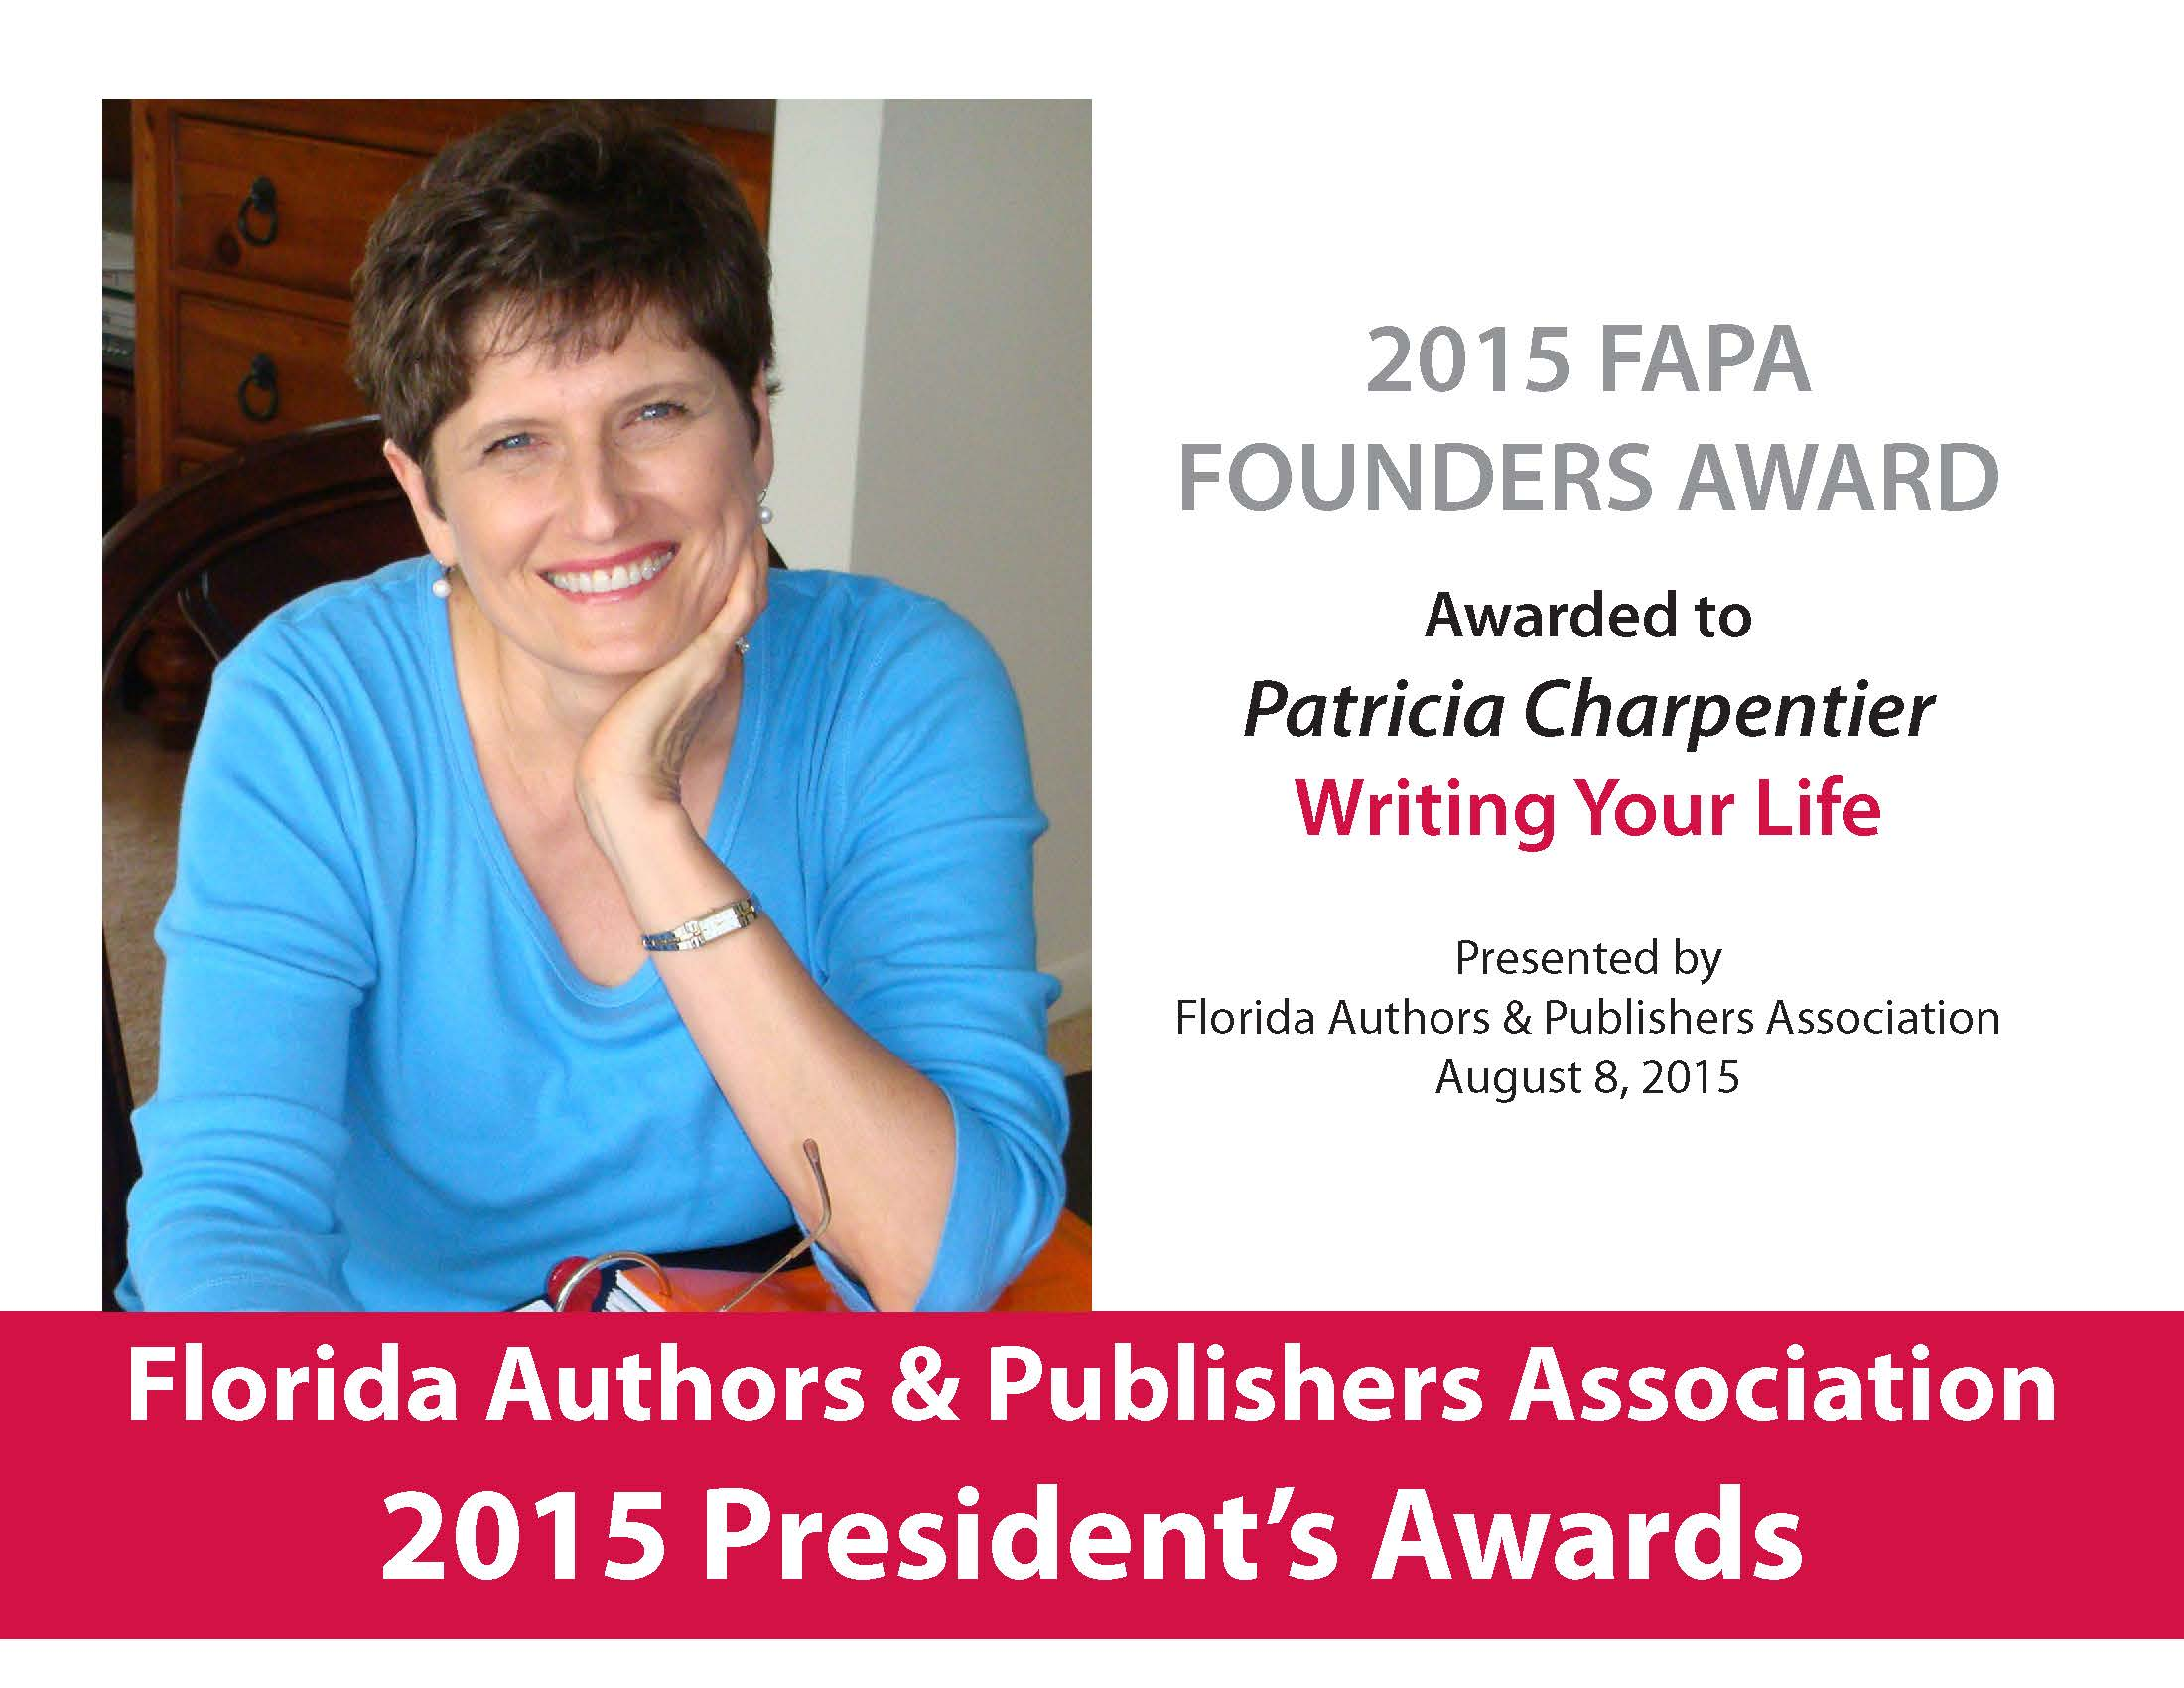 FAPA Founders Award